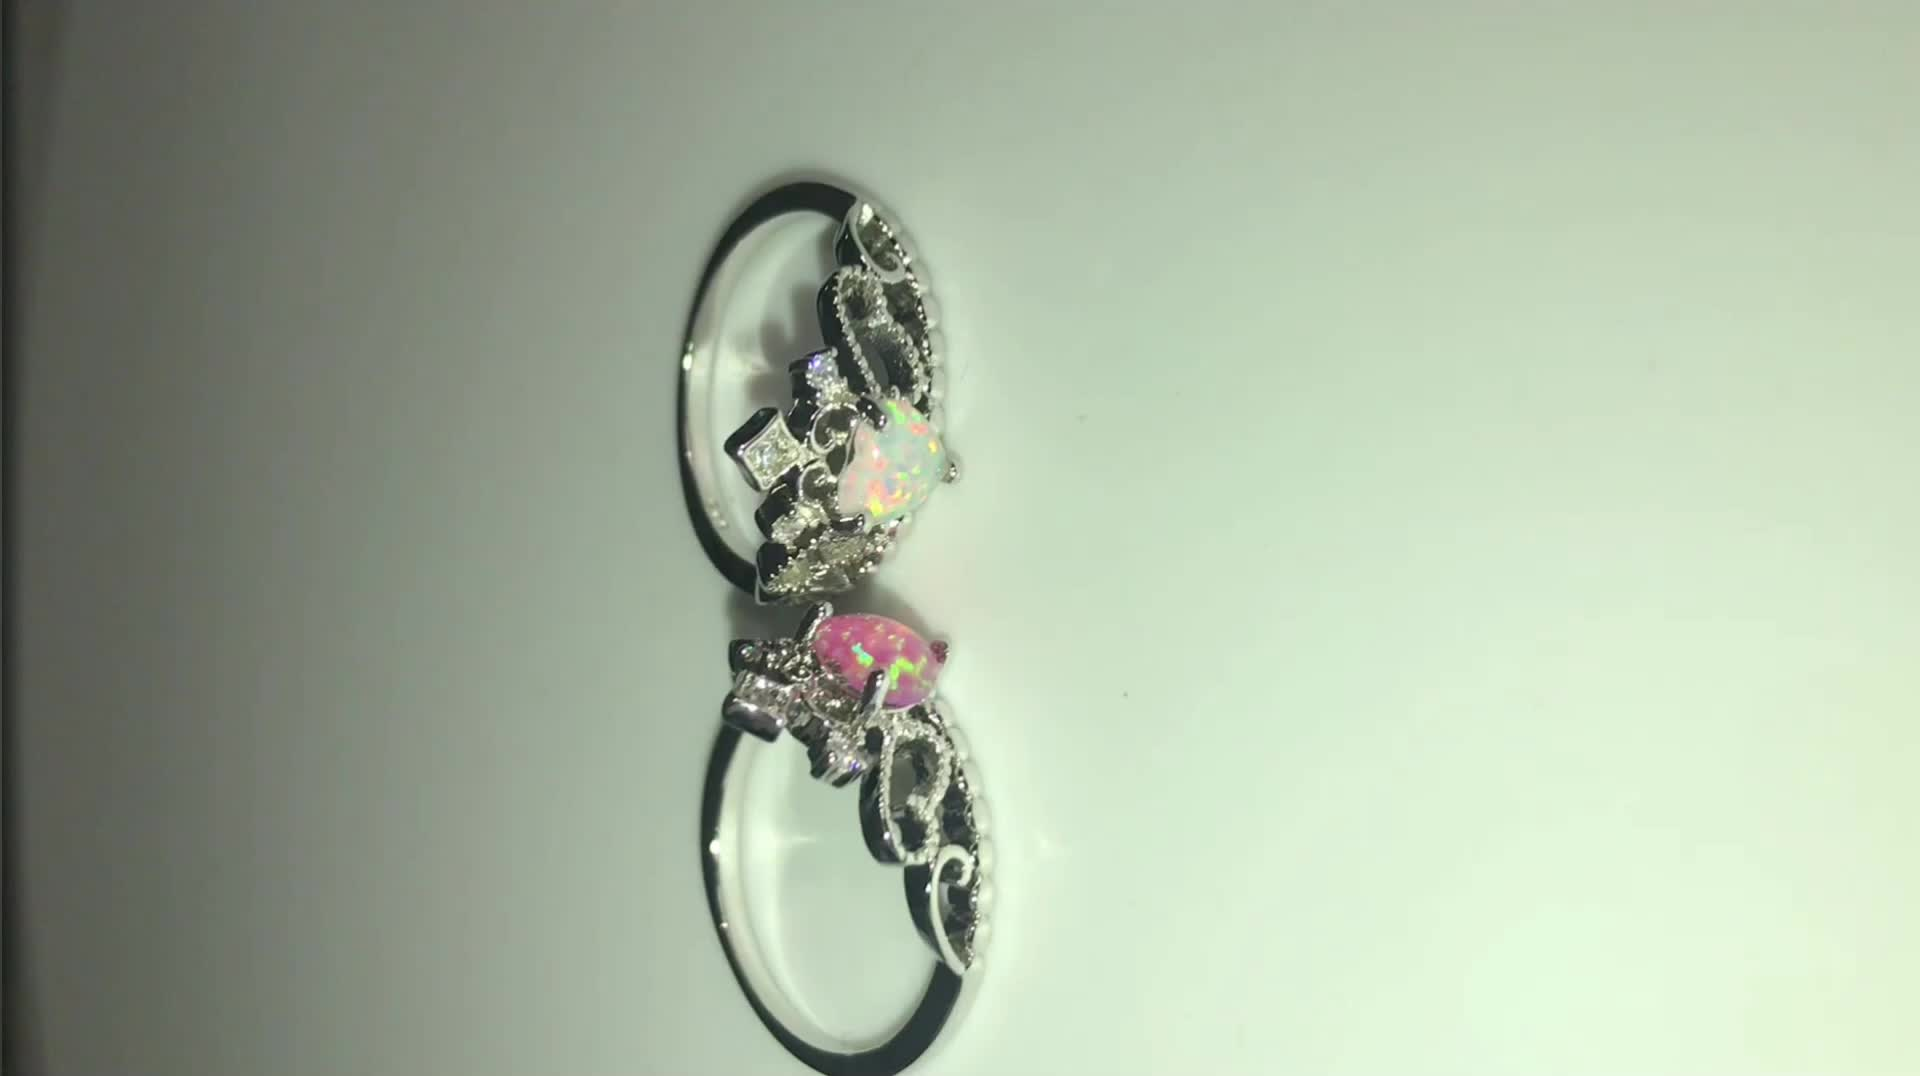 Ring frau S925 sterling silber herz geformt weiß opal crown ring